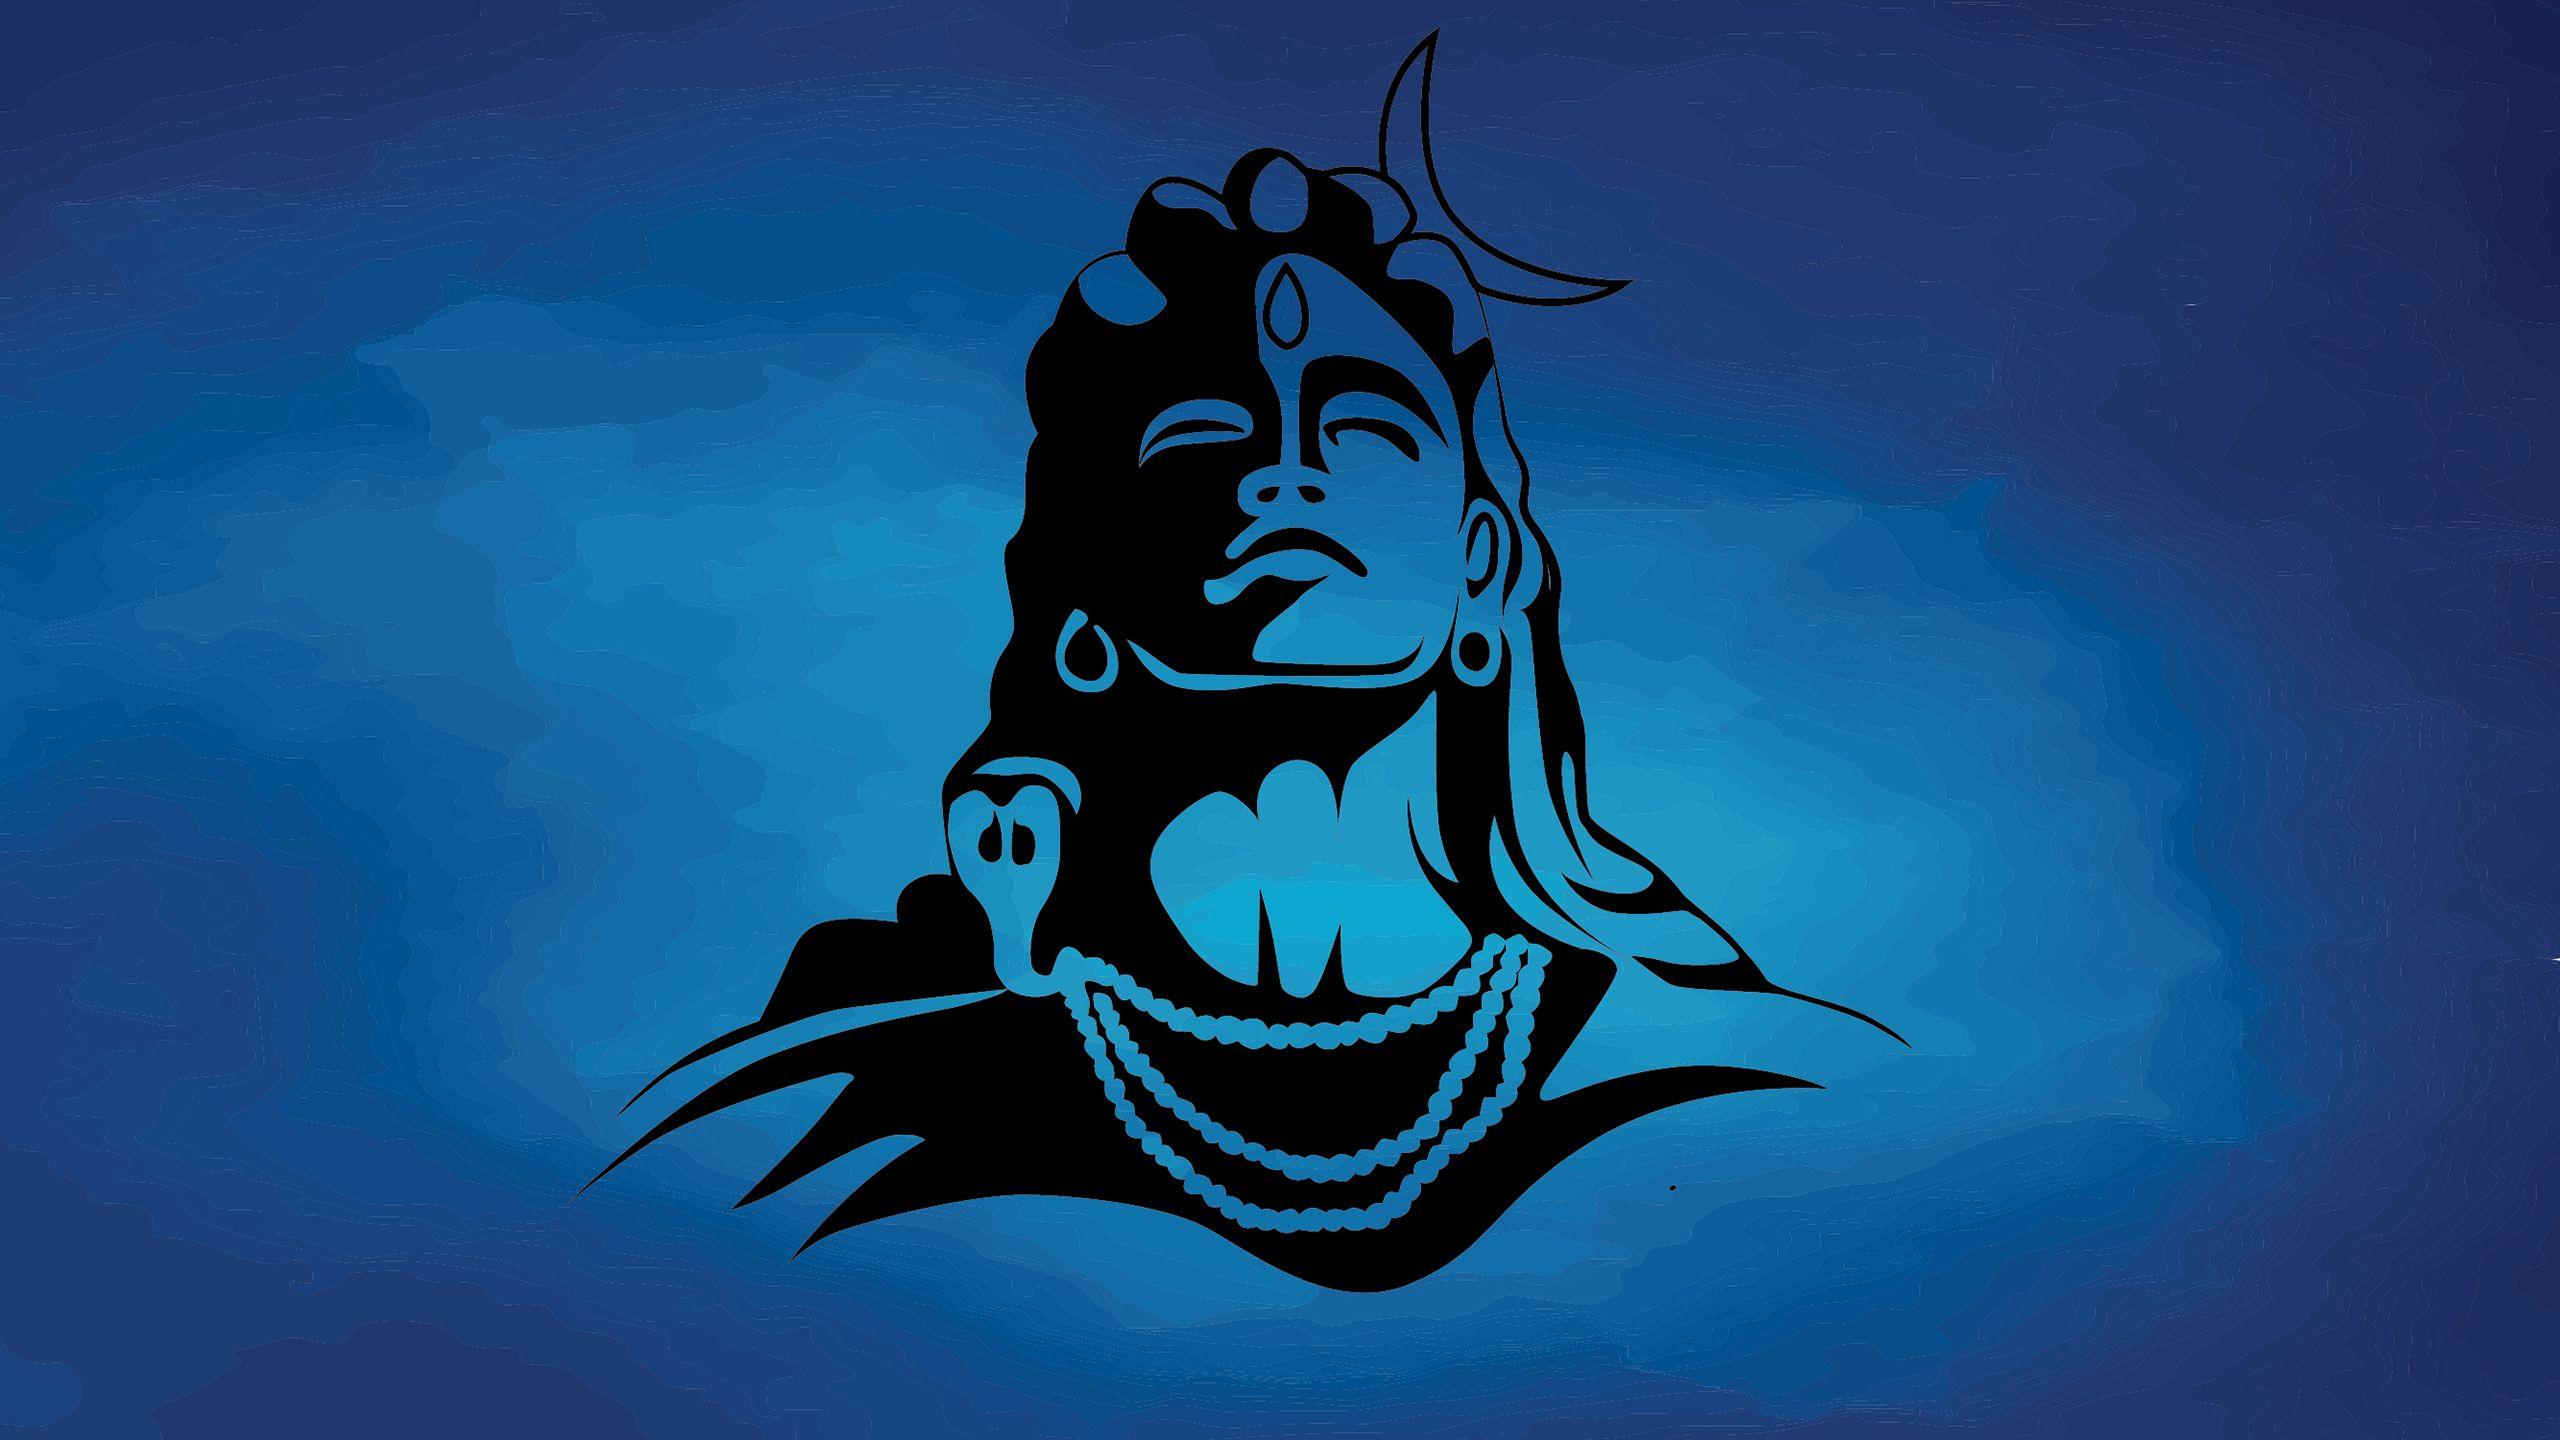 Shiva Wallpapers   Top Shiva Backgrounds   WallpaperAccess 2560x1440